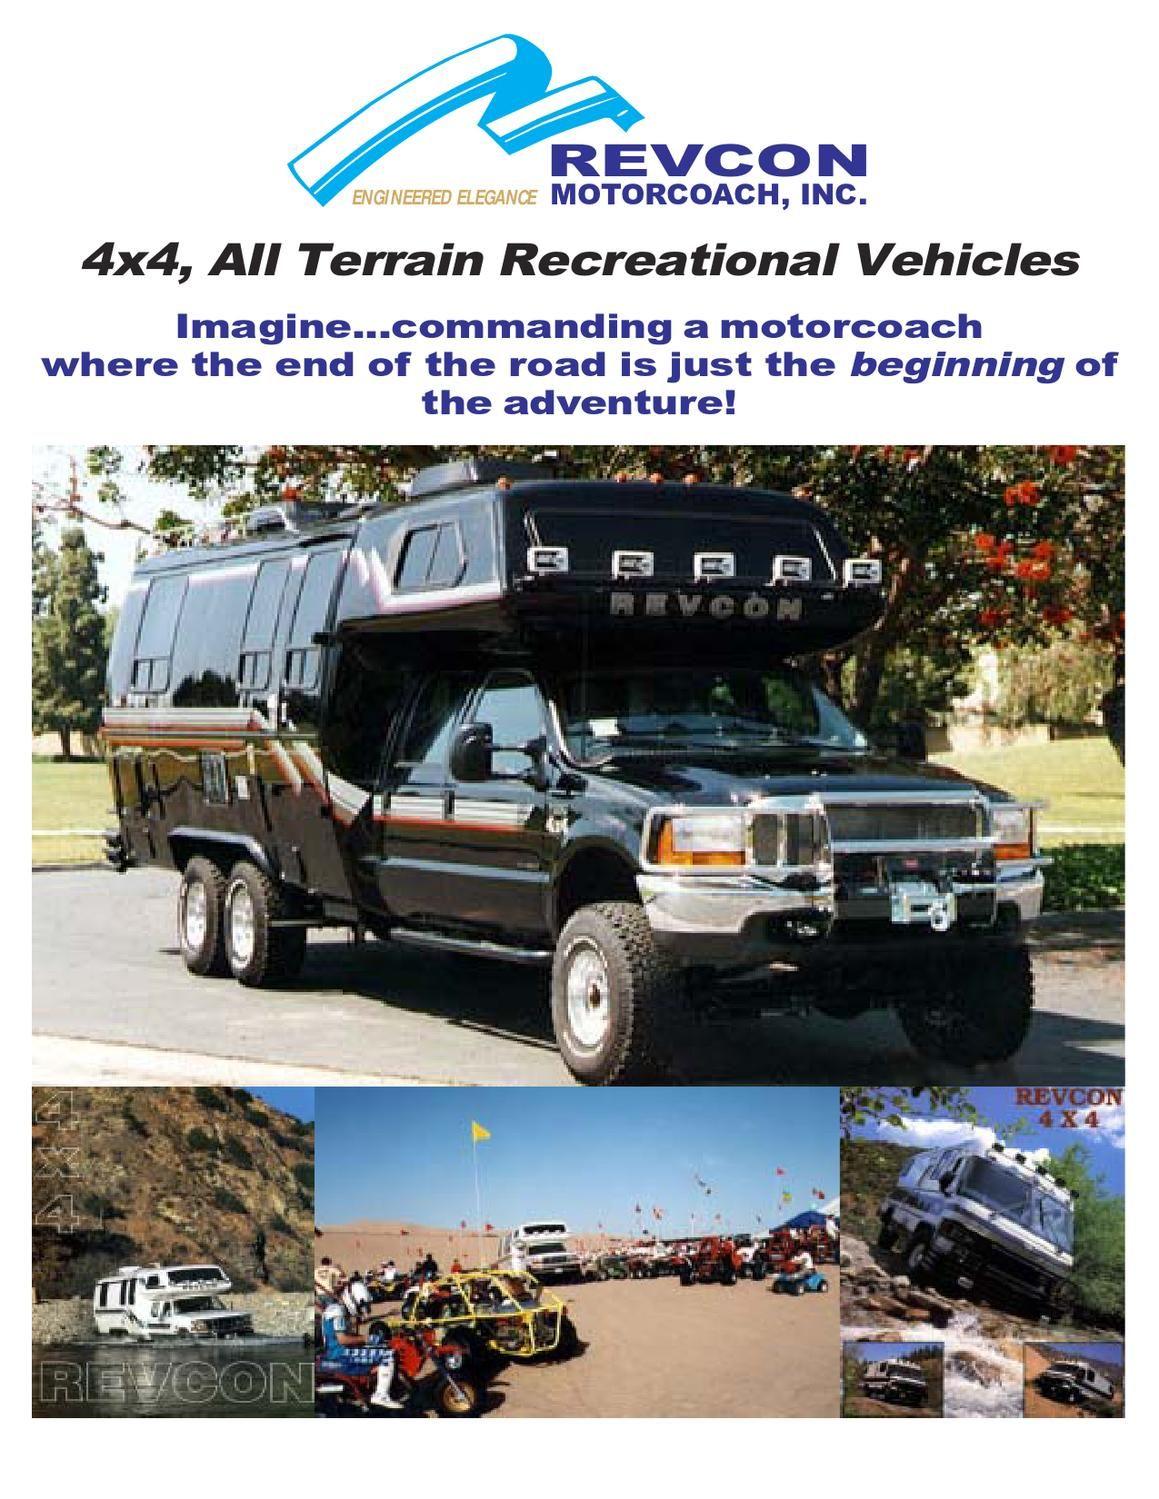 Revcon Trailblazer 4x4   RV's   Truck camper, Truck camping